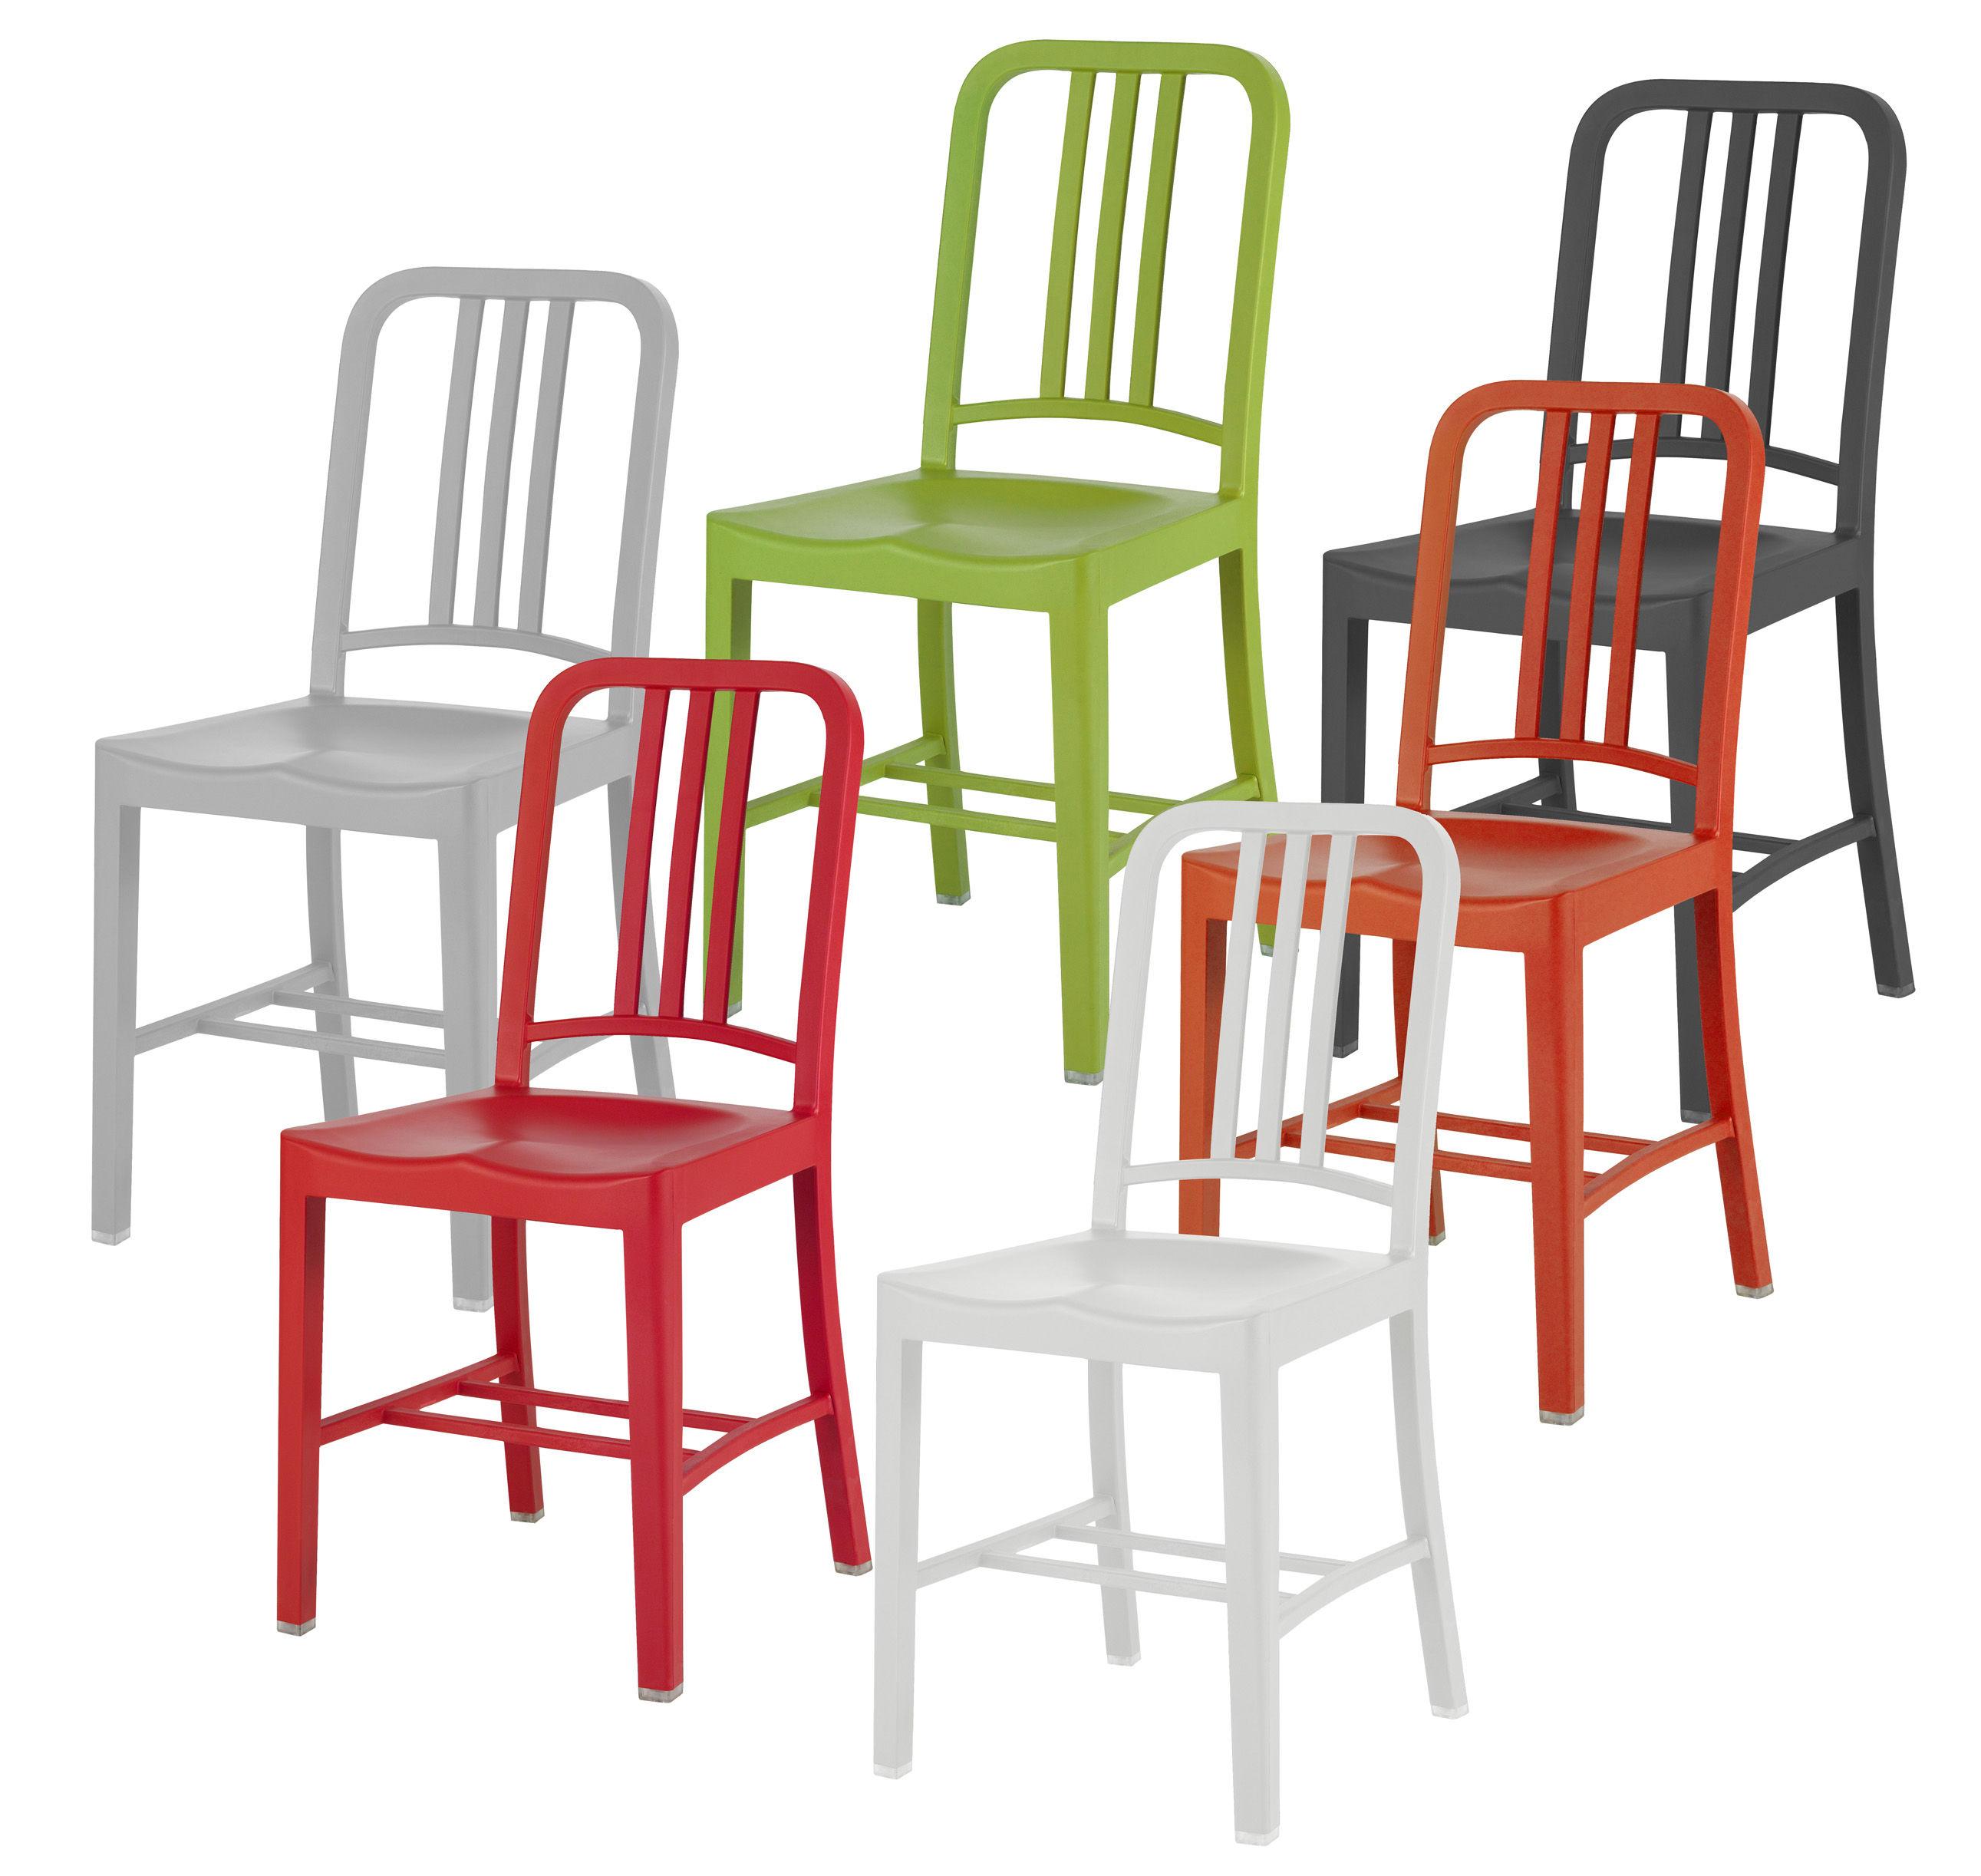 111 navy chair indoor sedia arancione by emeco made in design. Black Bedroom Furniture Sets. Home Design Ideas